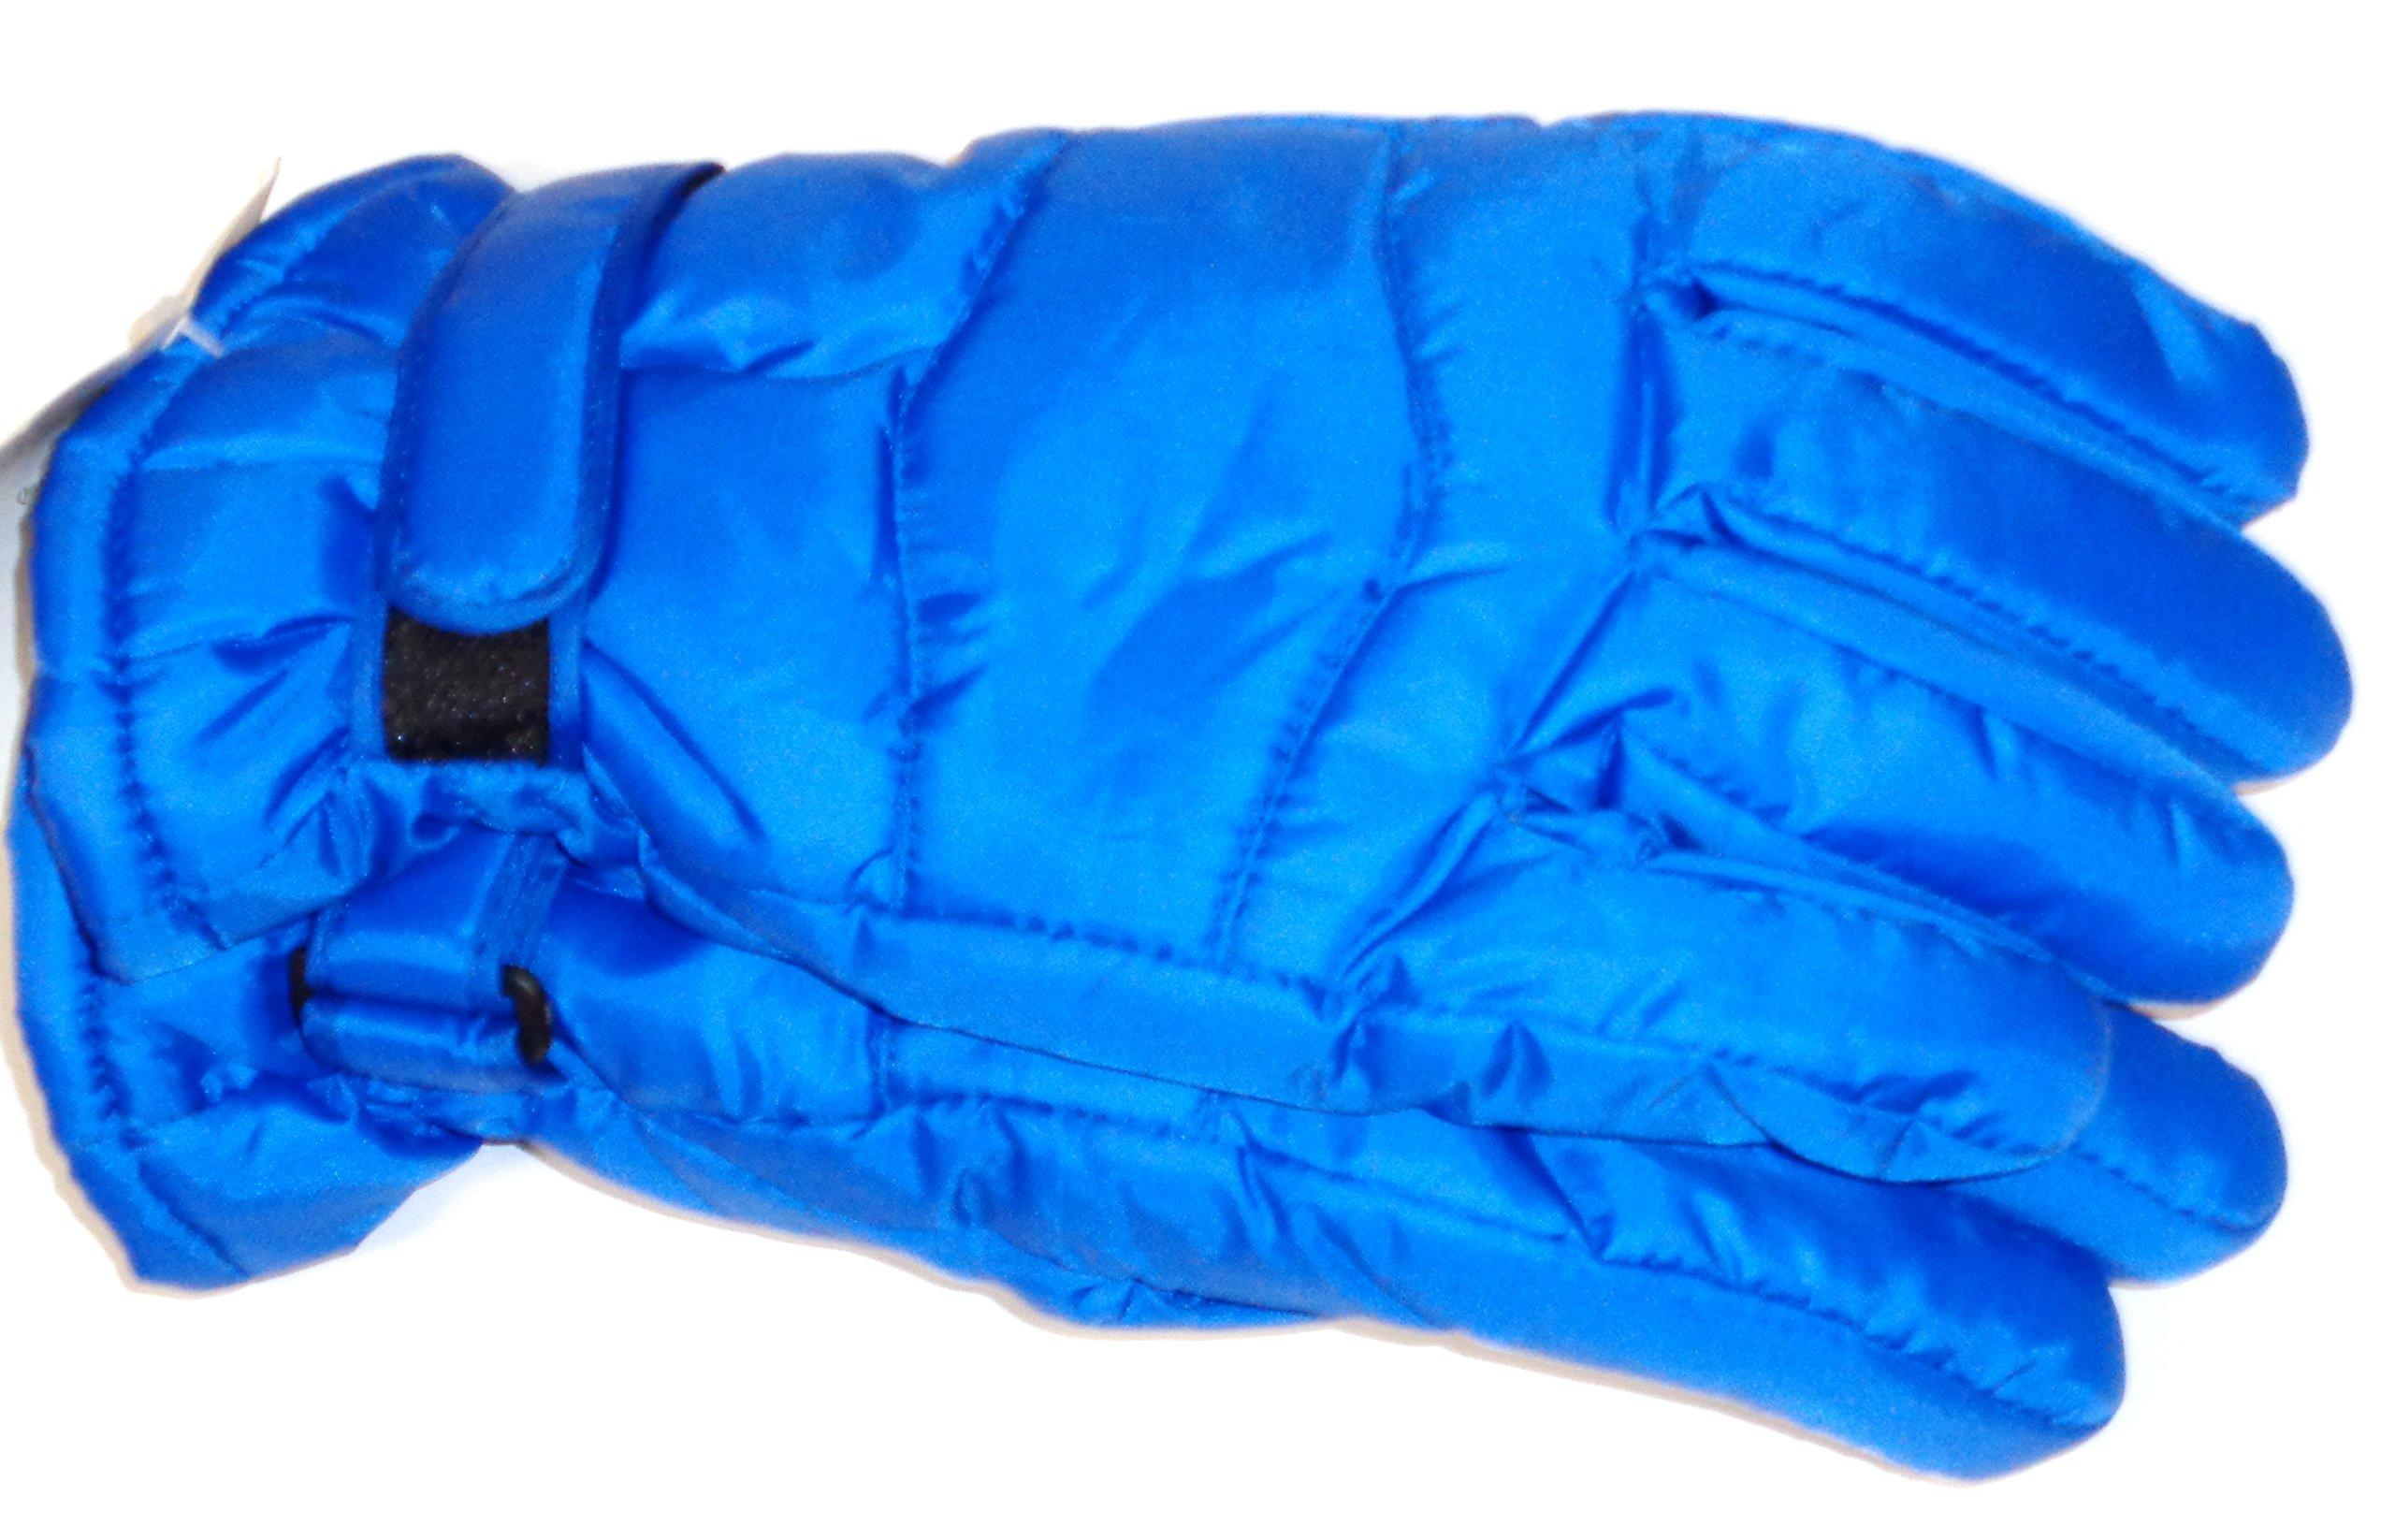 Dypel Royal Color Luxurious Looking Ski Gloves for Men Size Med